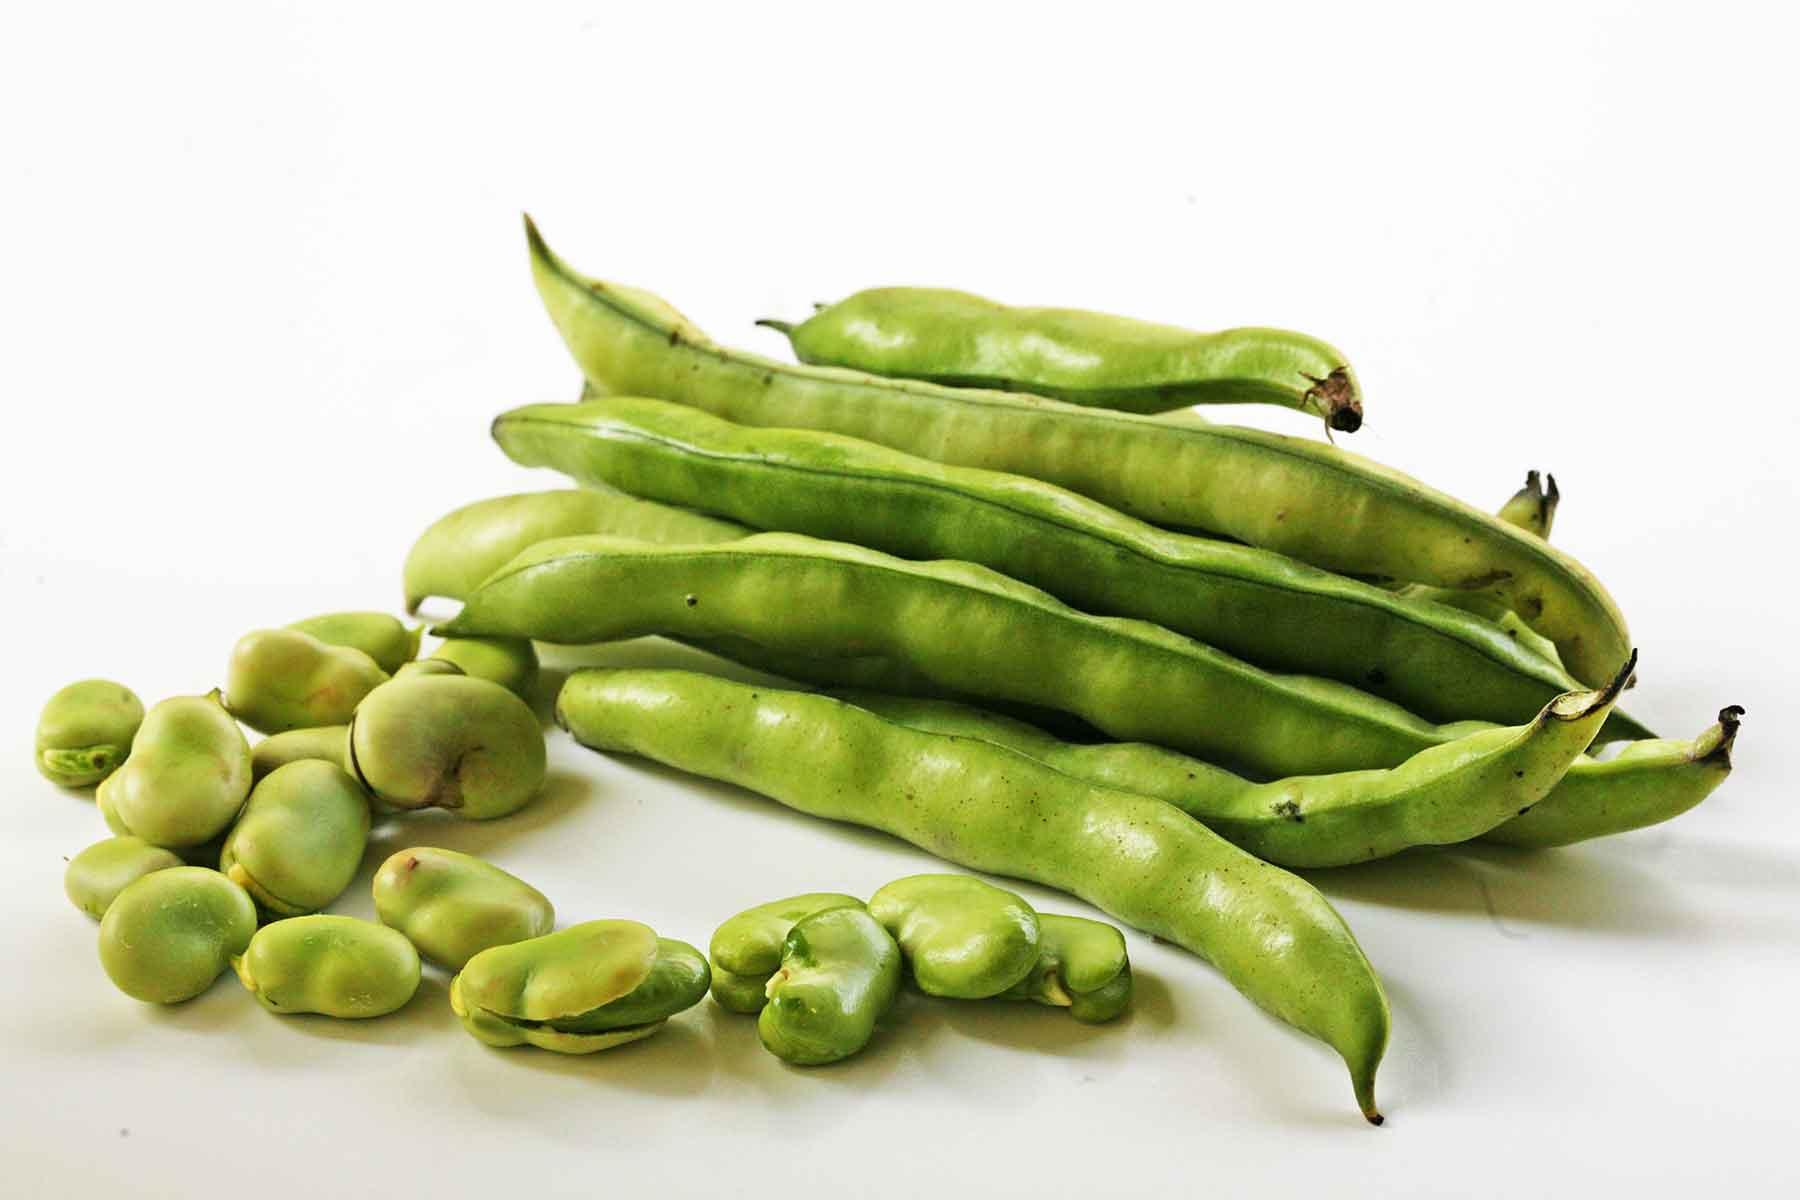 PunjabKesari, fava beans